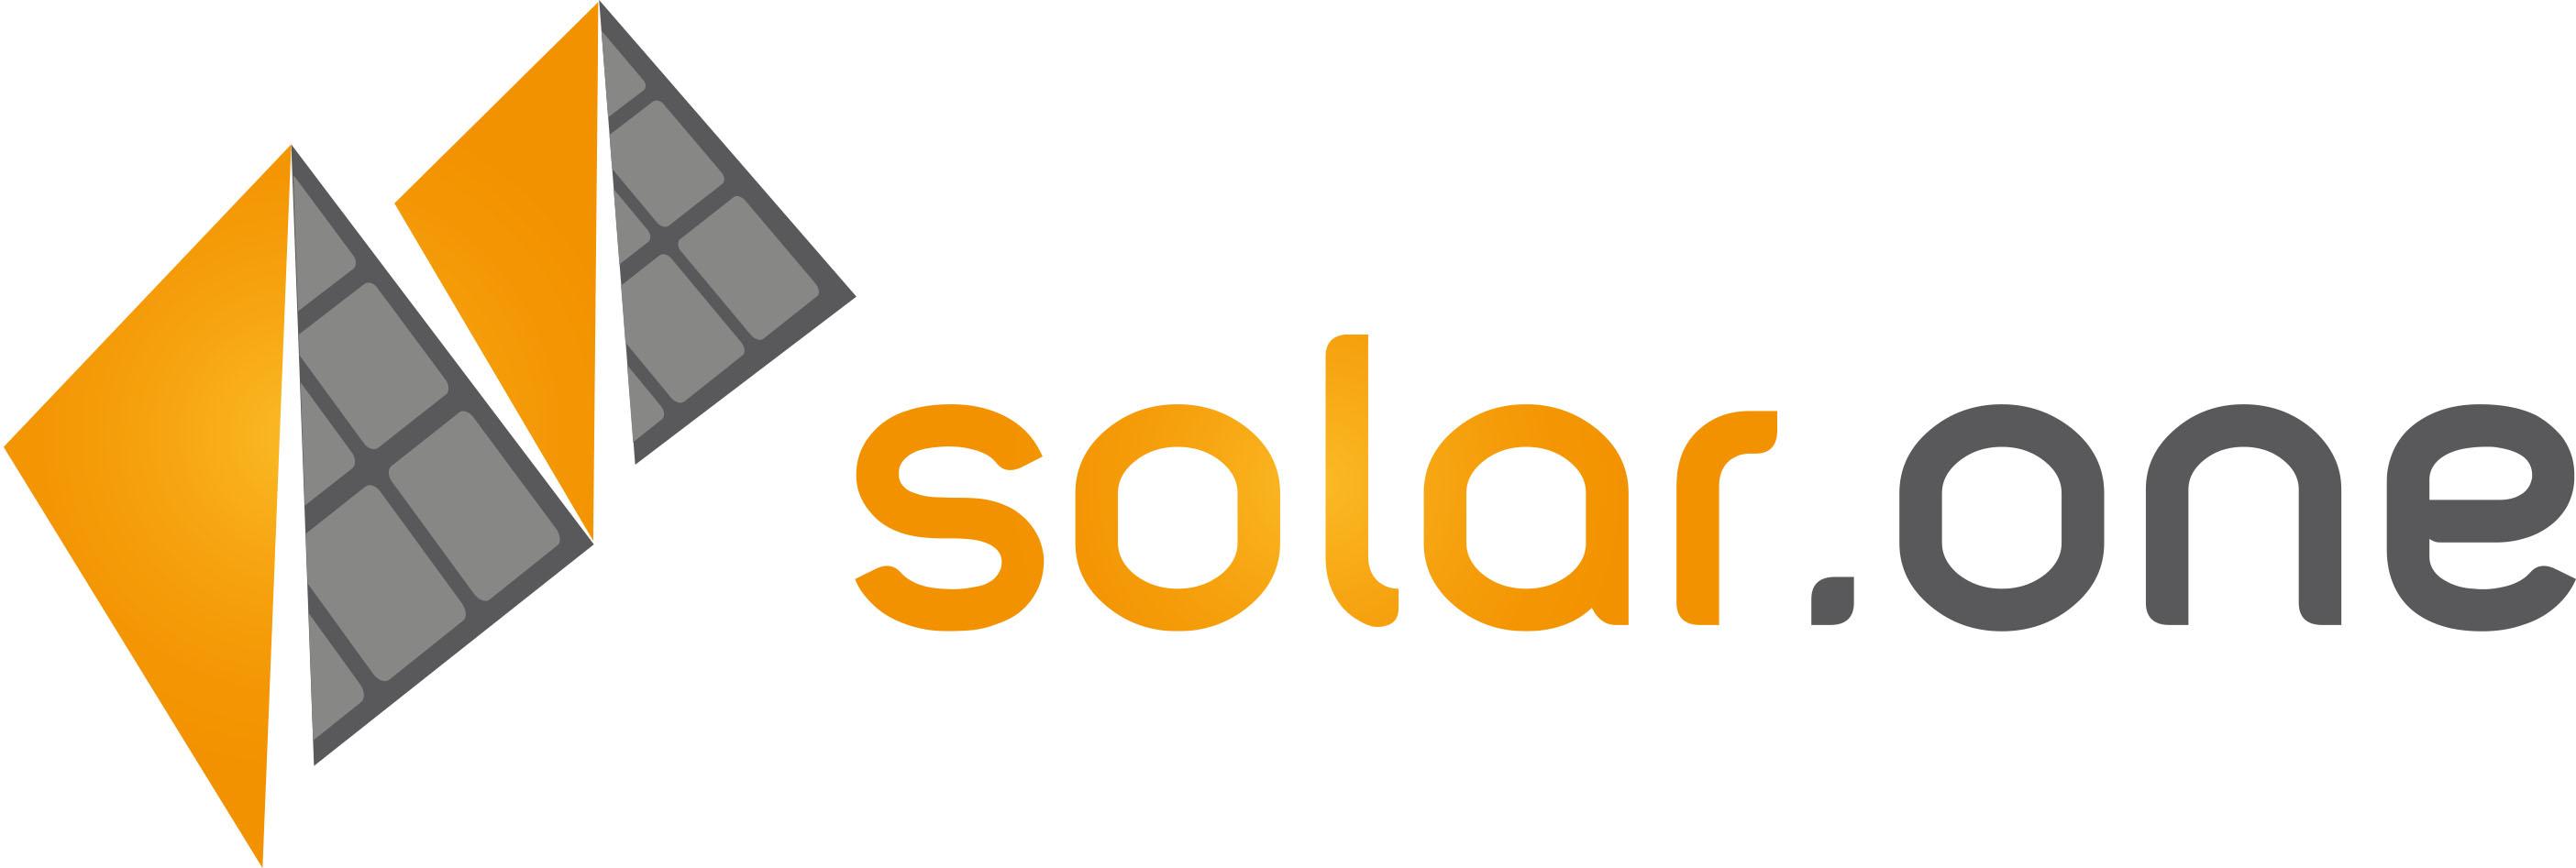 solar.one